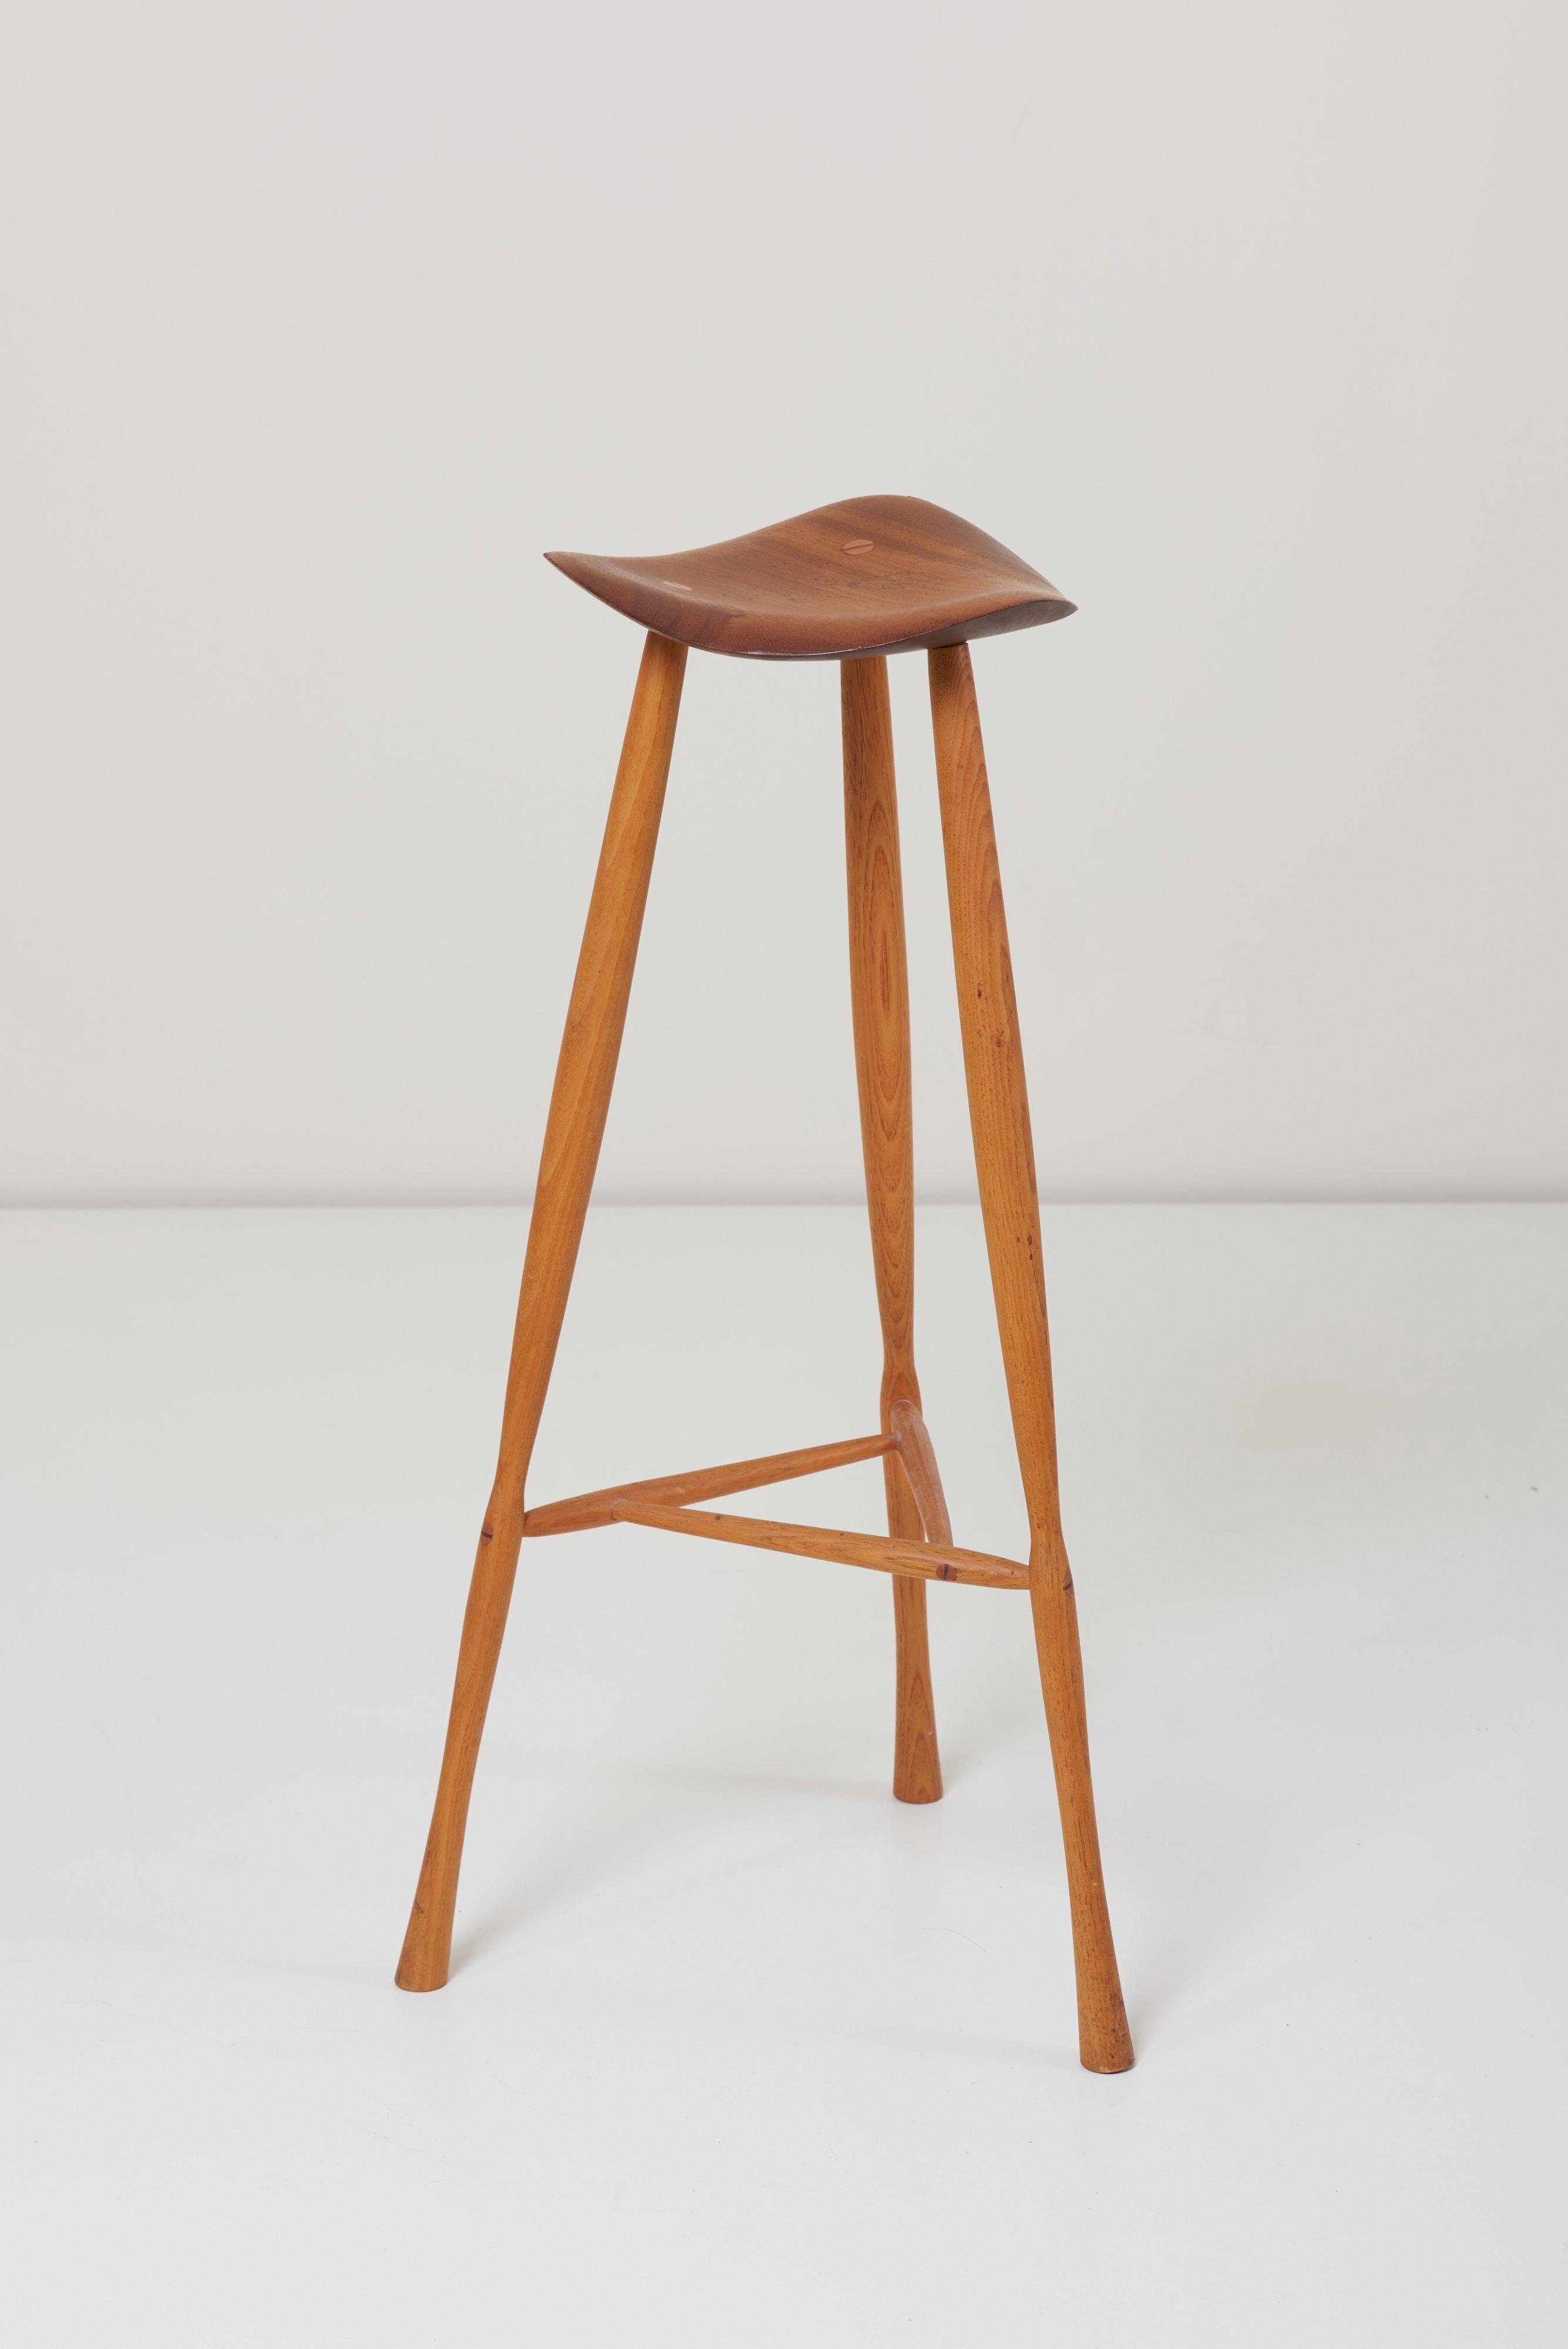 Admirable Studio Craft Stool By Karl Seemuller Us 1975 Beatyapartments Chair Design Images Beatyapartmentscom